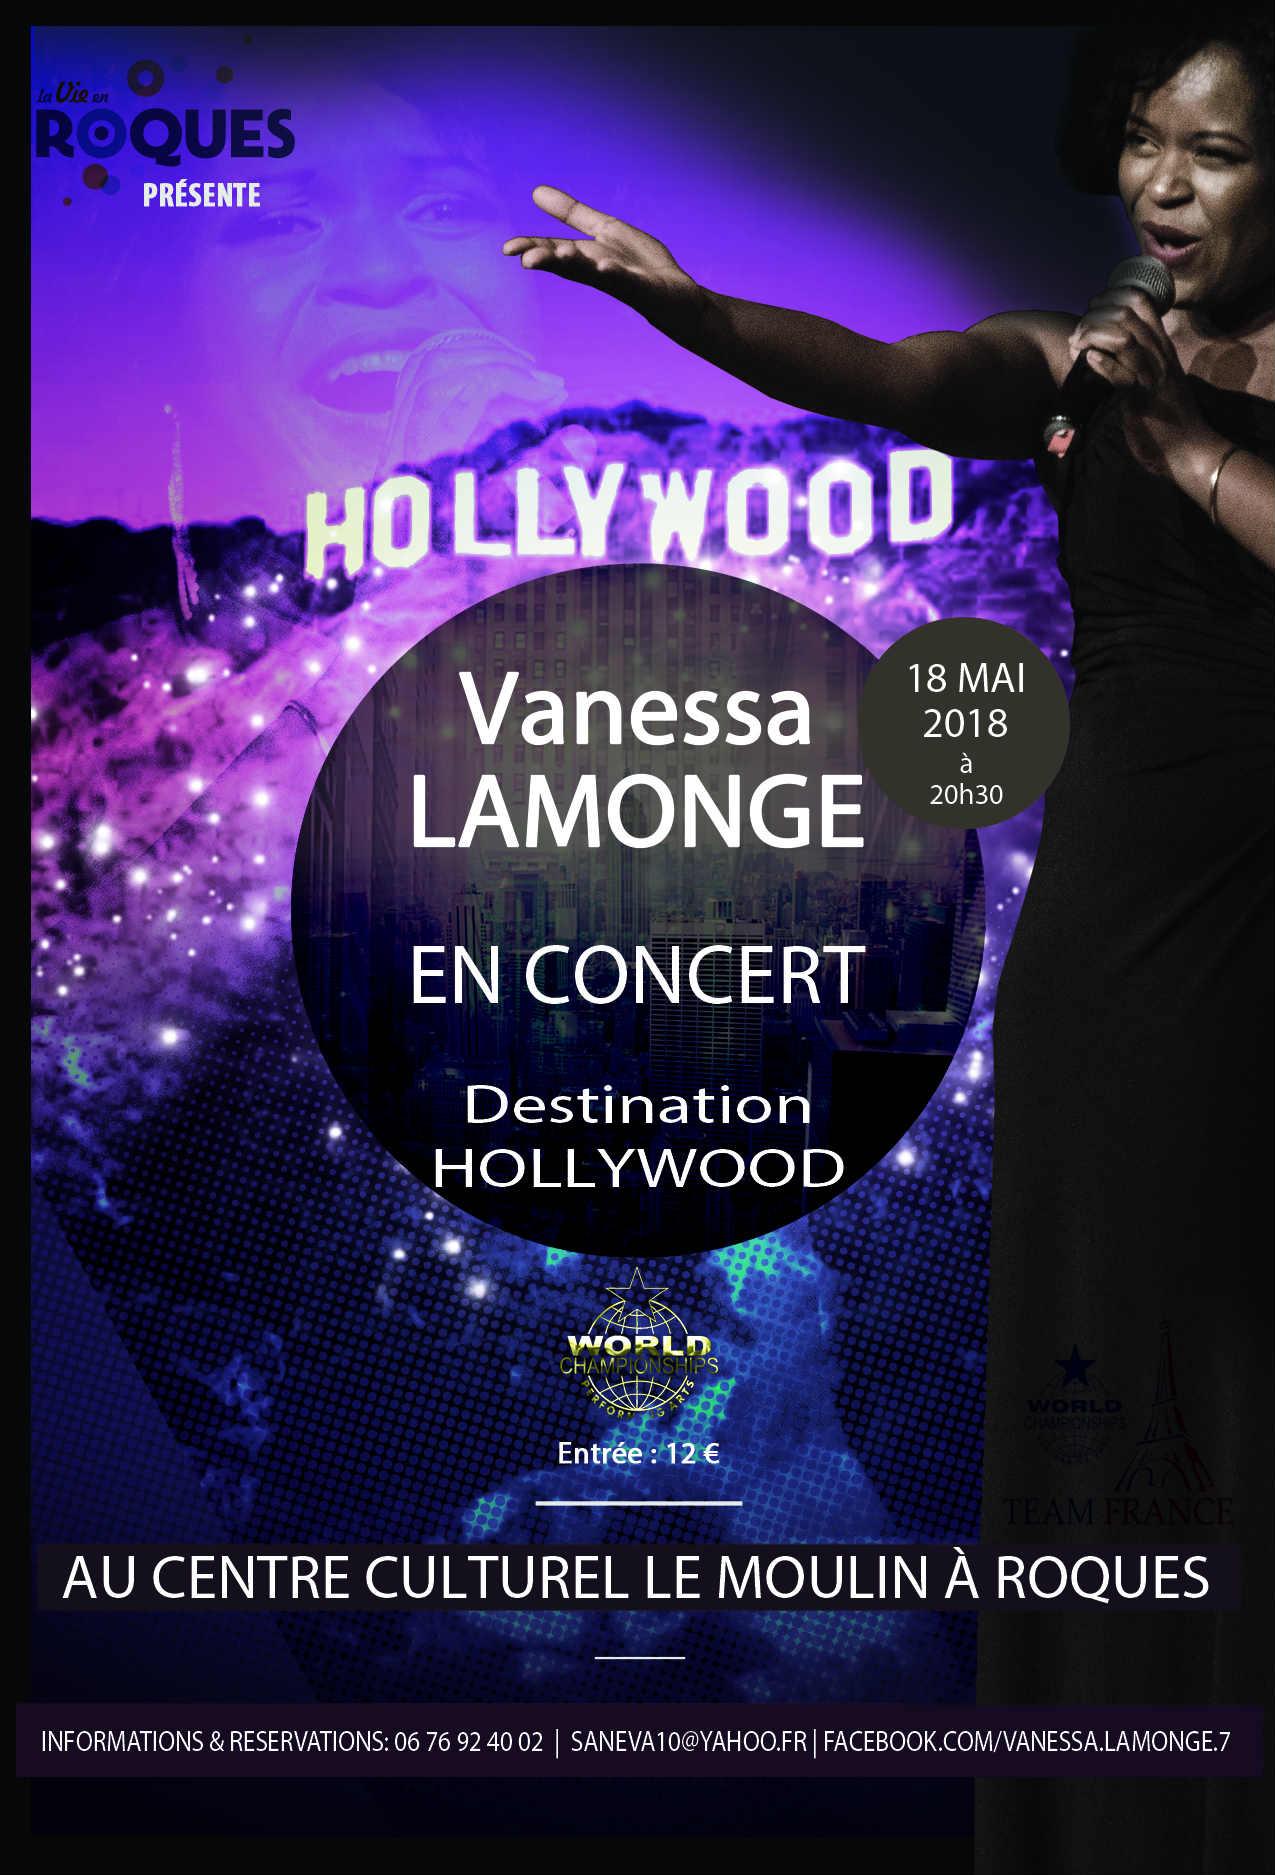 Vanessa Lamonge en concert: Destination Hollywood!